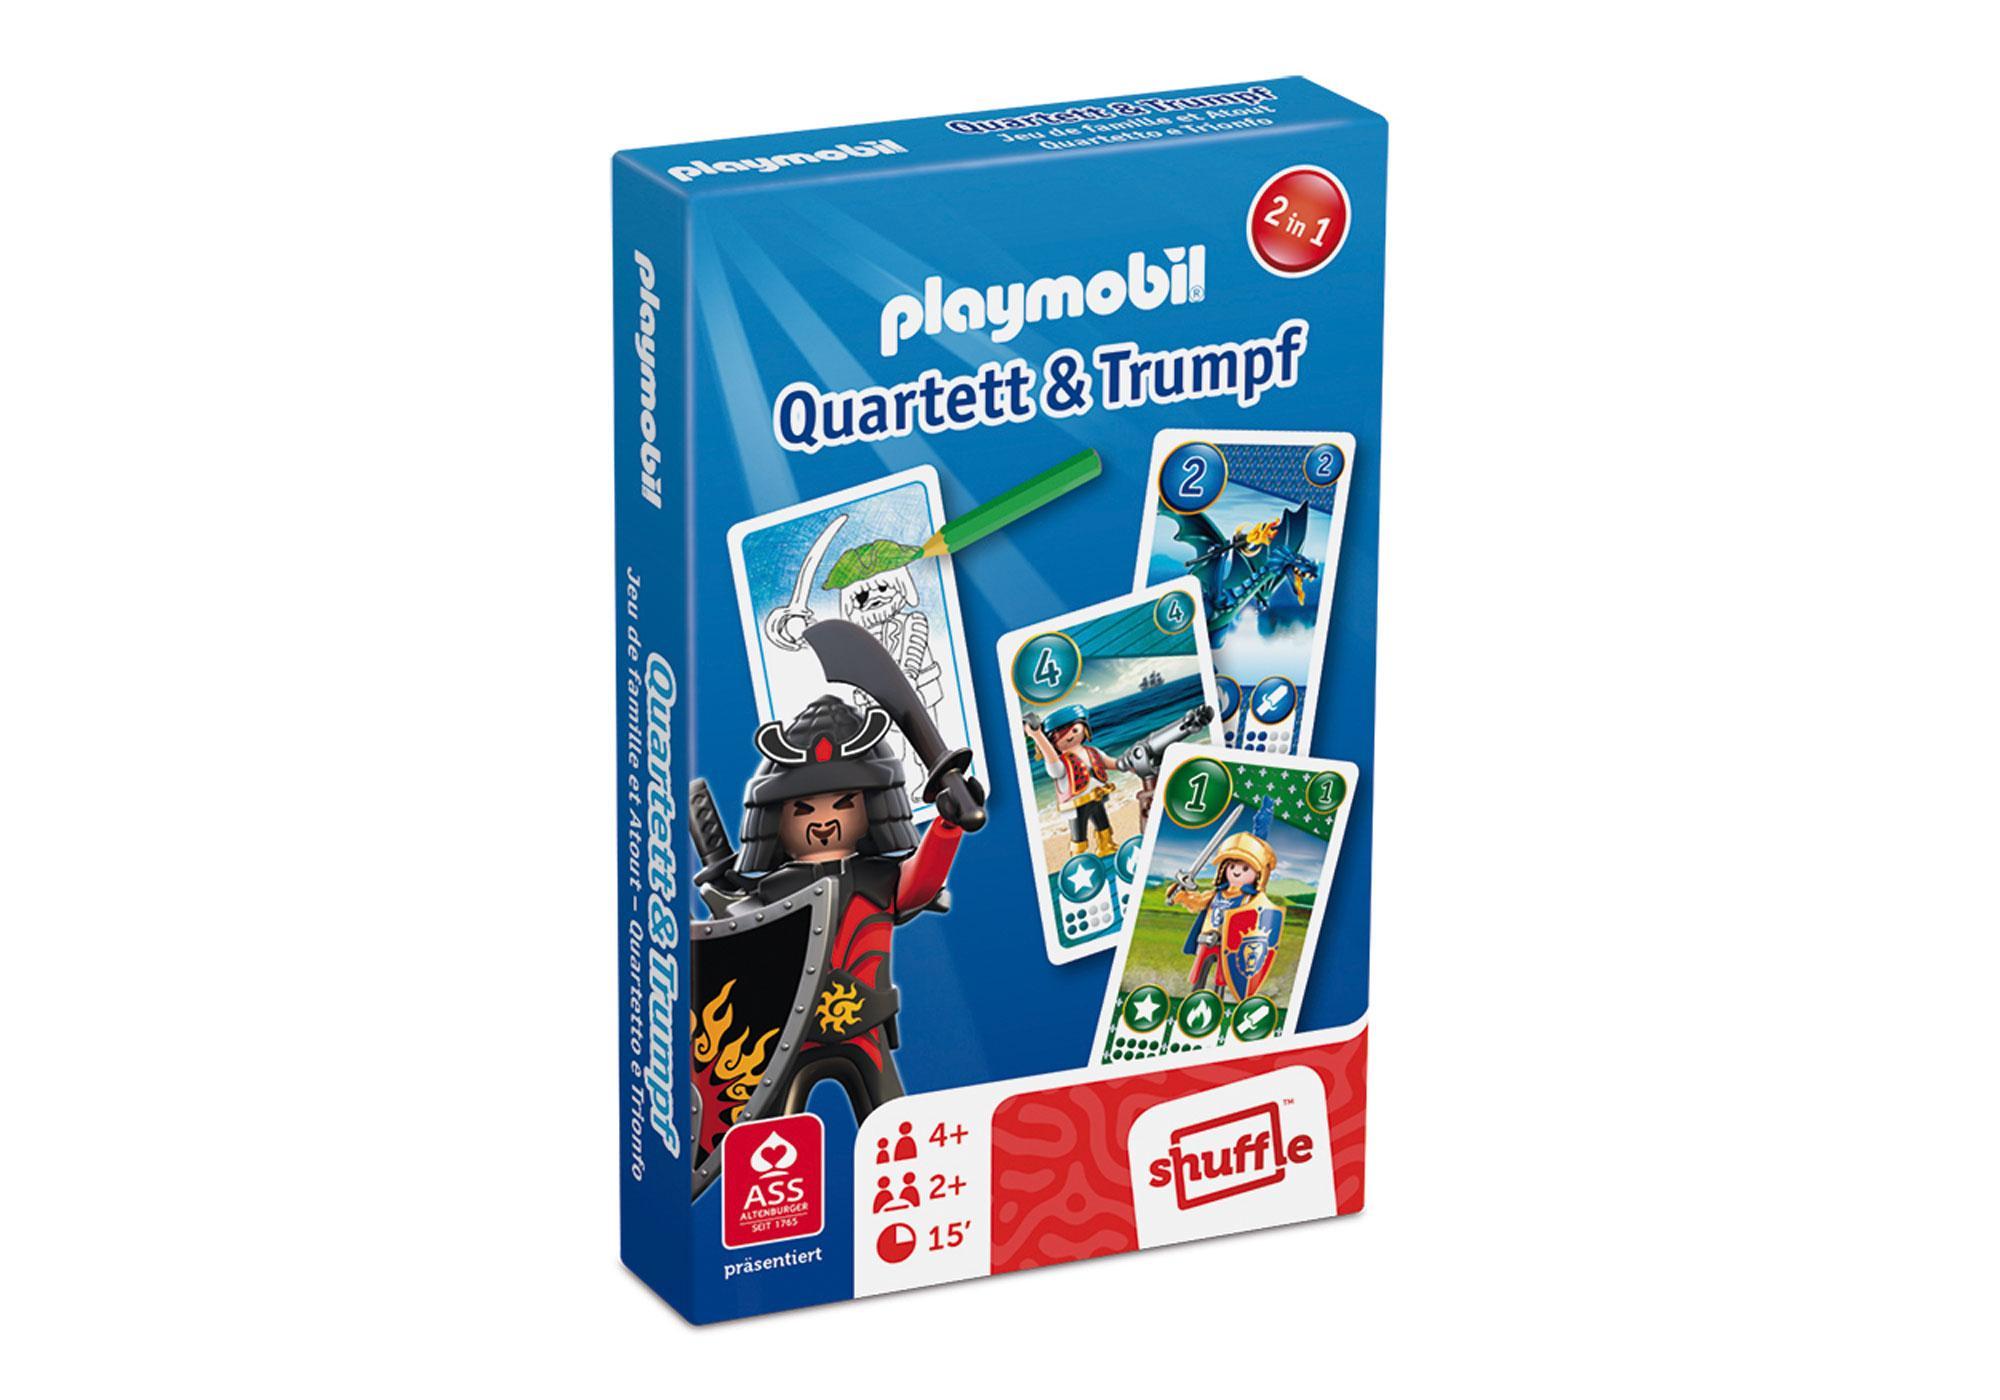 http://media.playmobil.com/i/playmobil/80095_product_detail